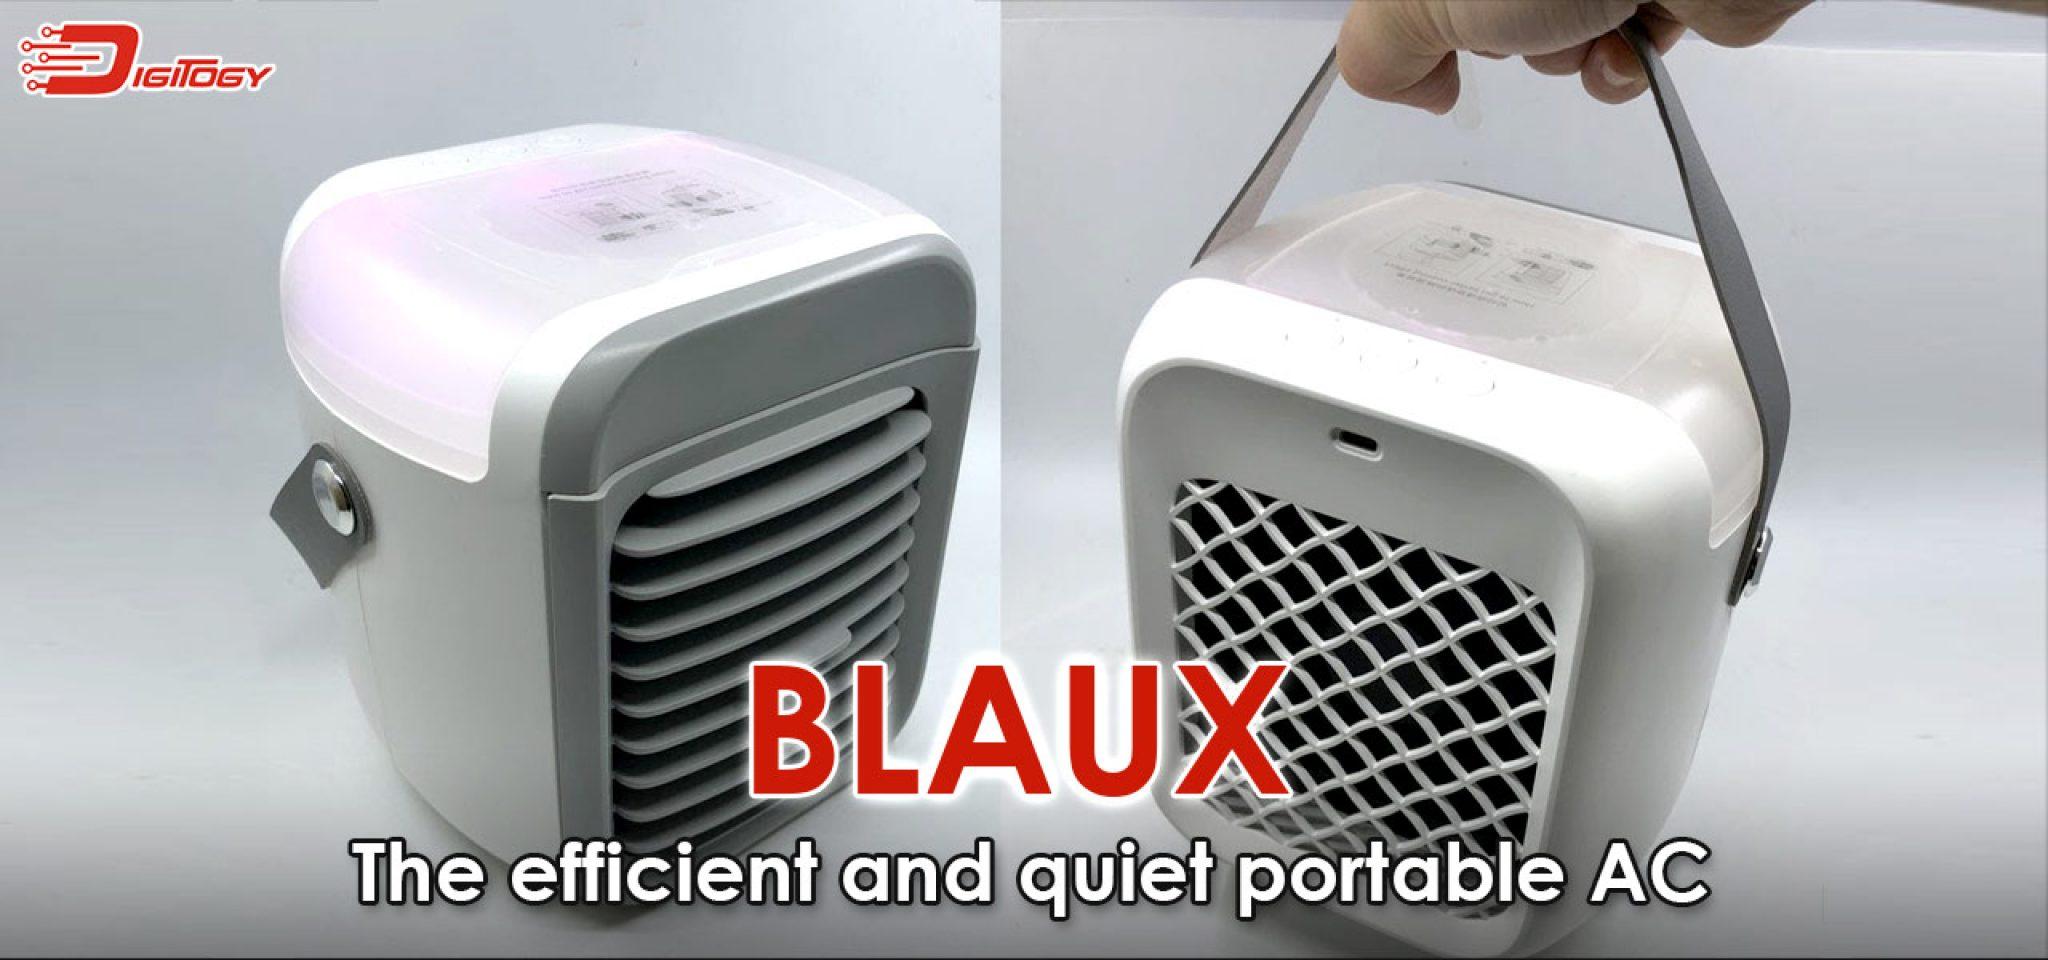 Blaux portable ac Review 2021: The Best Portable Air ...